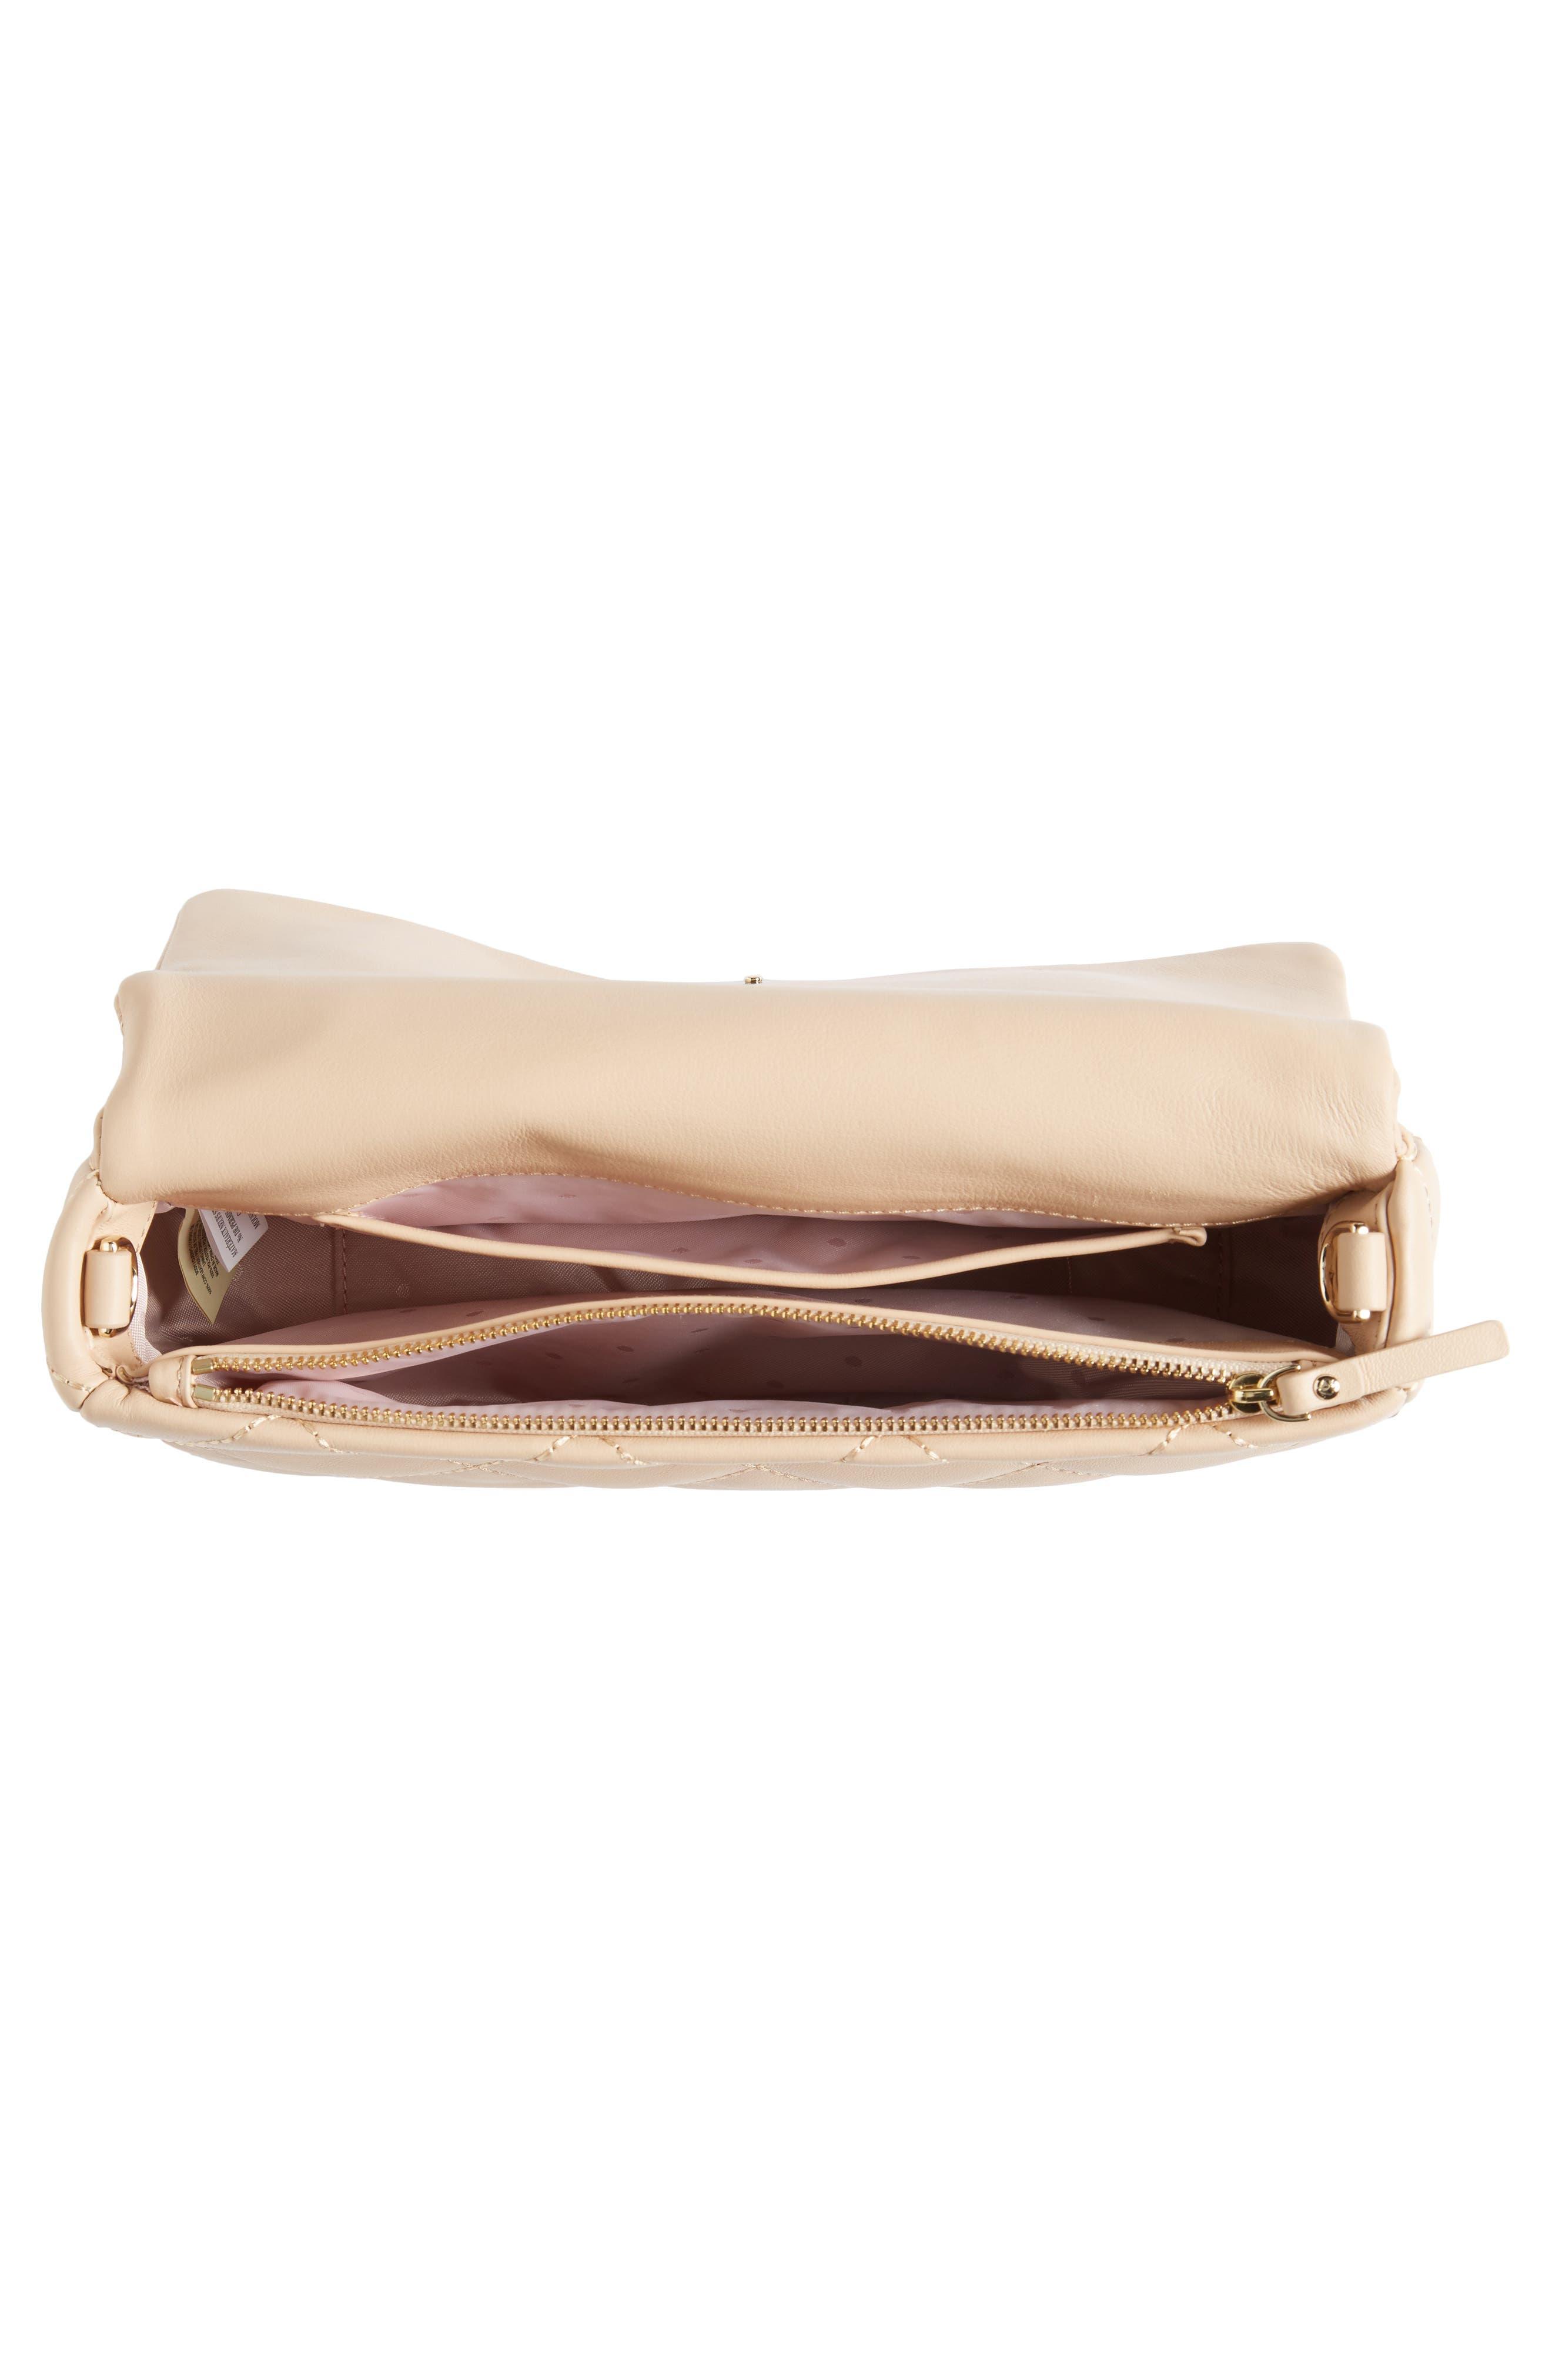 emerson place - serena leather shoulder bag,                             Alternate thumbnail 11, color,